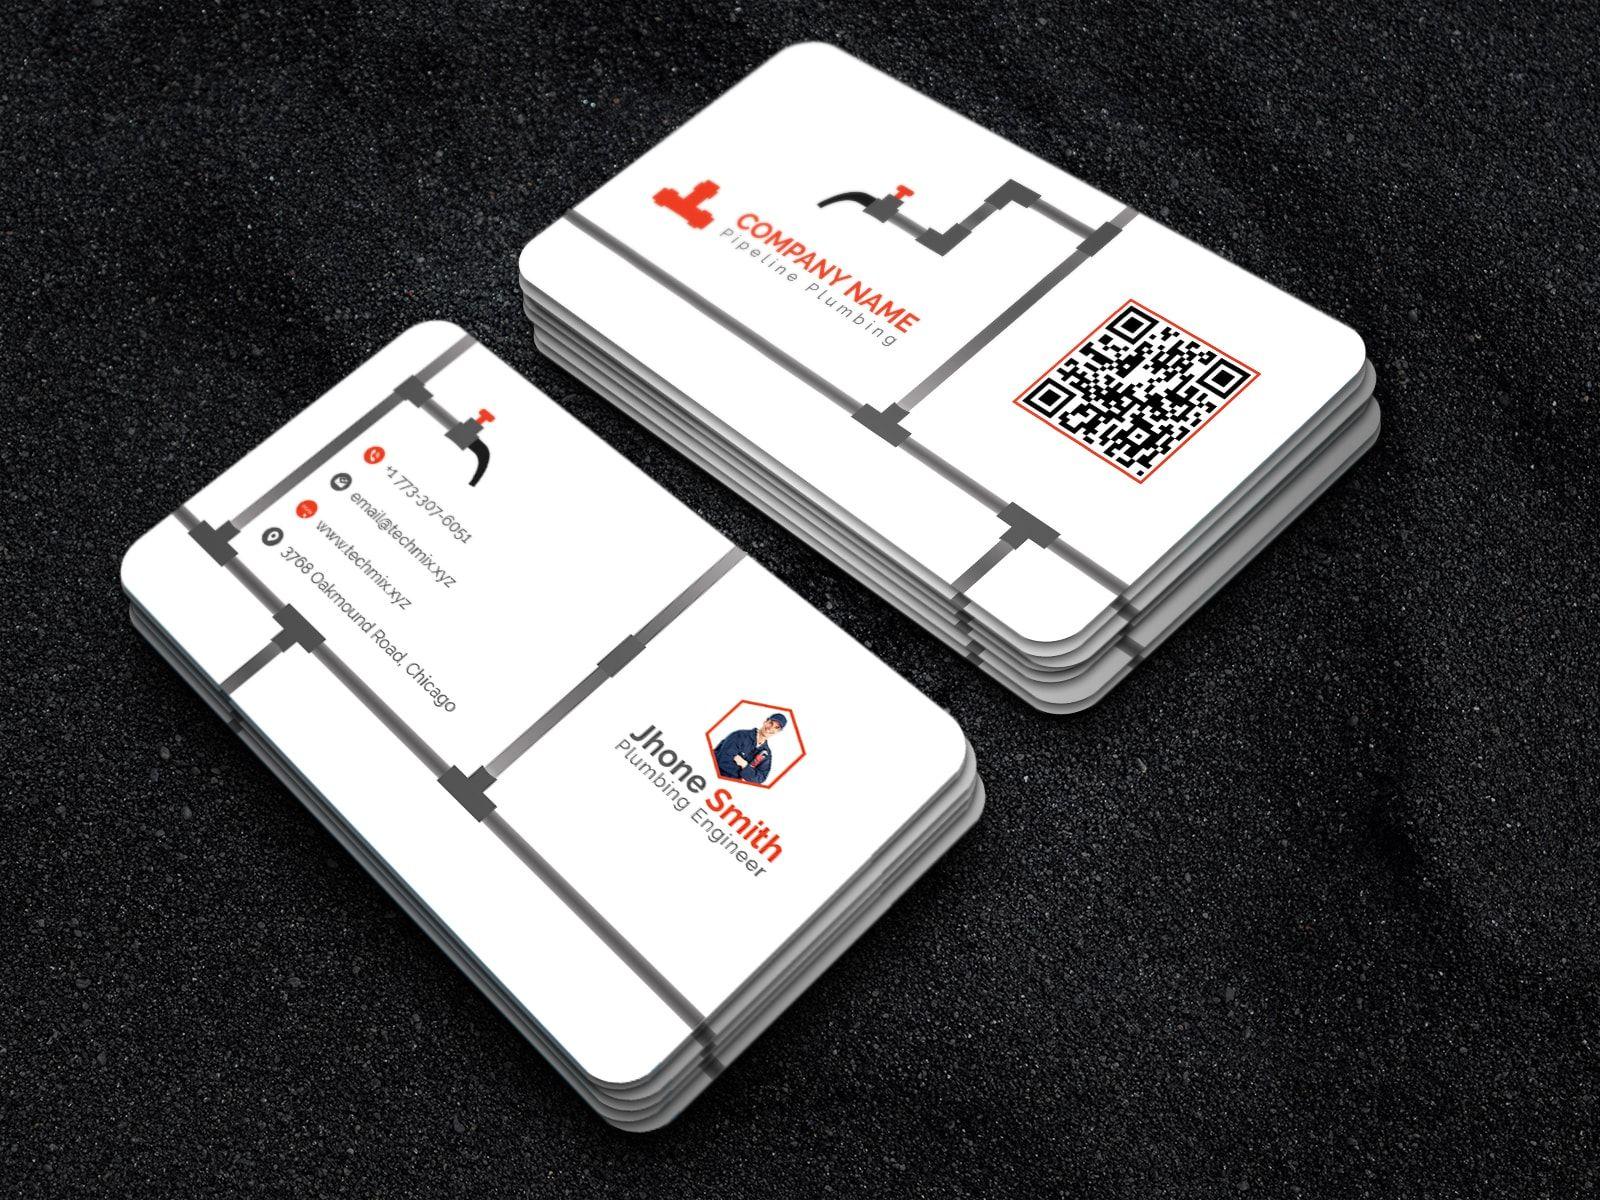 Best Plumber Business Card Template Vertical Business Card Design Business Cards Collection Business Cards Creative